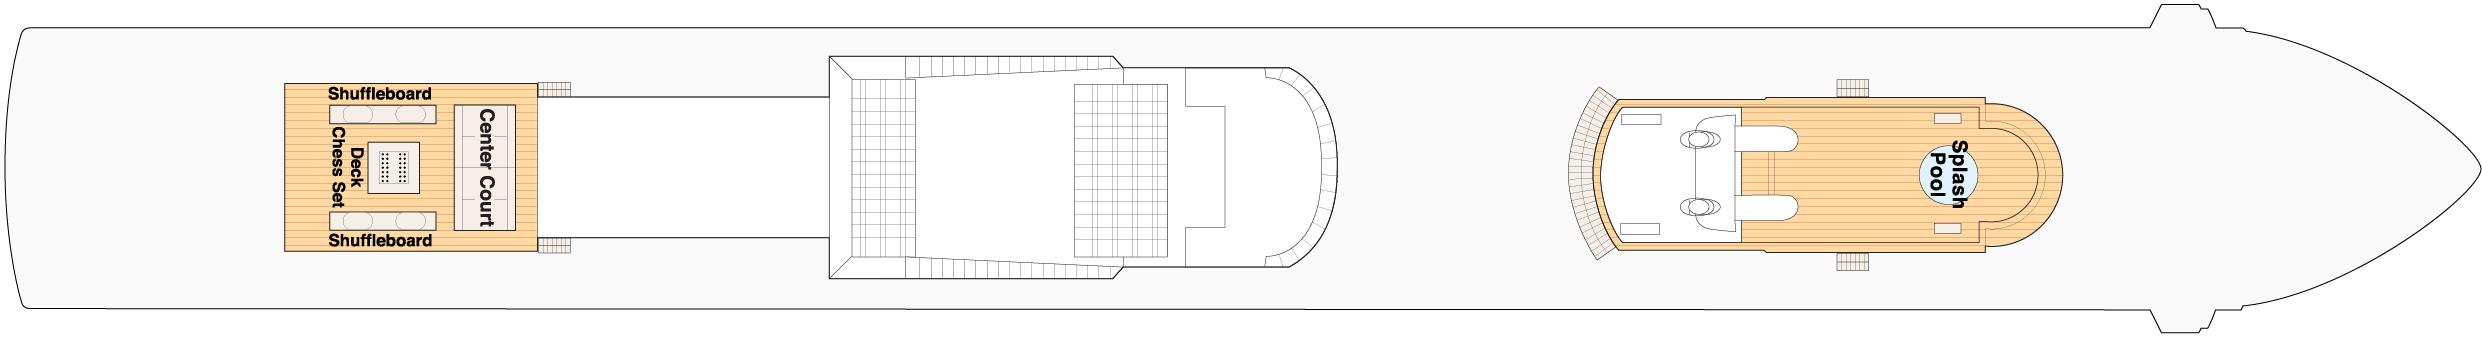 Deck 16 – Sports